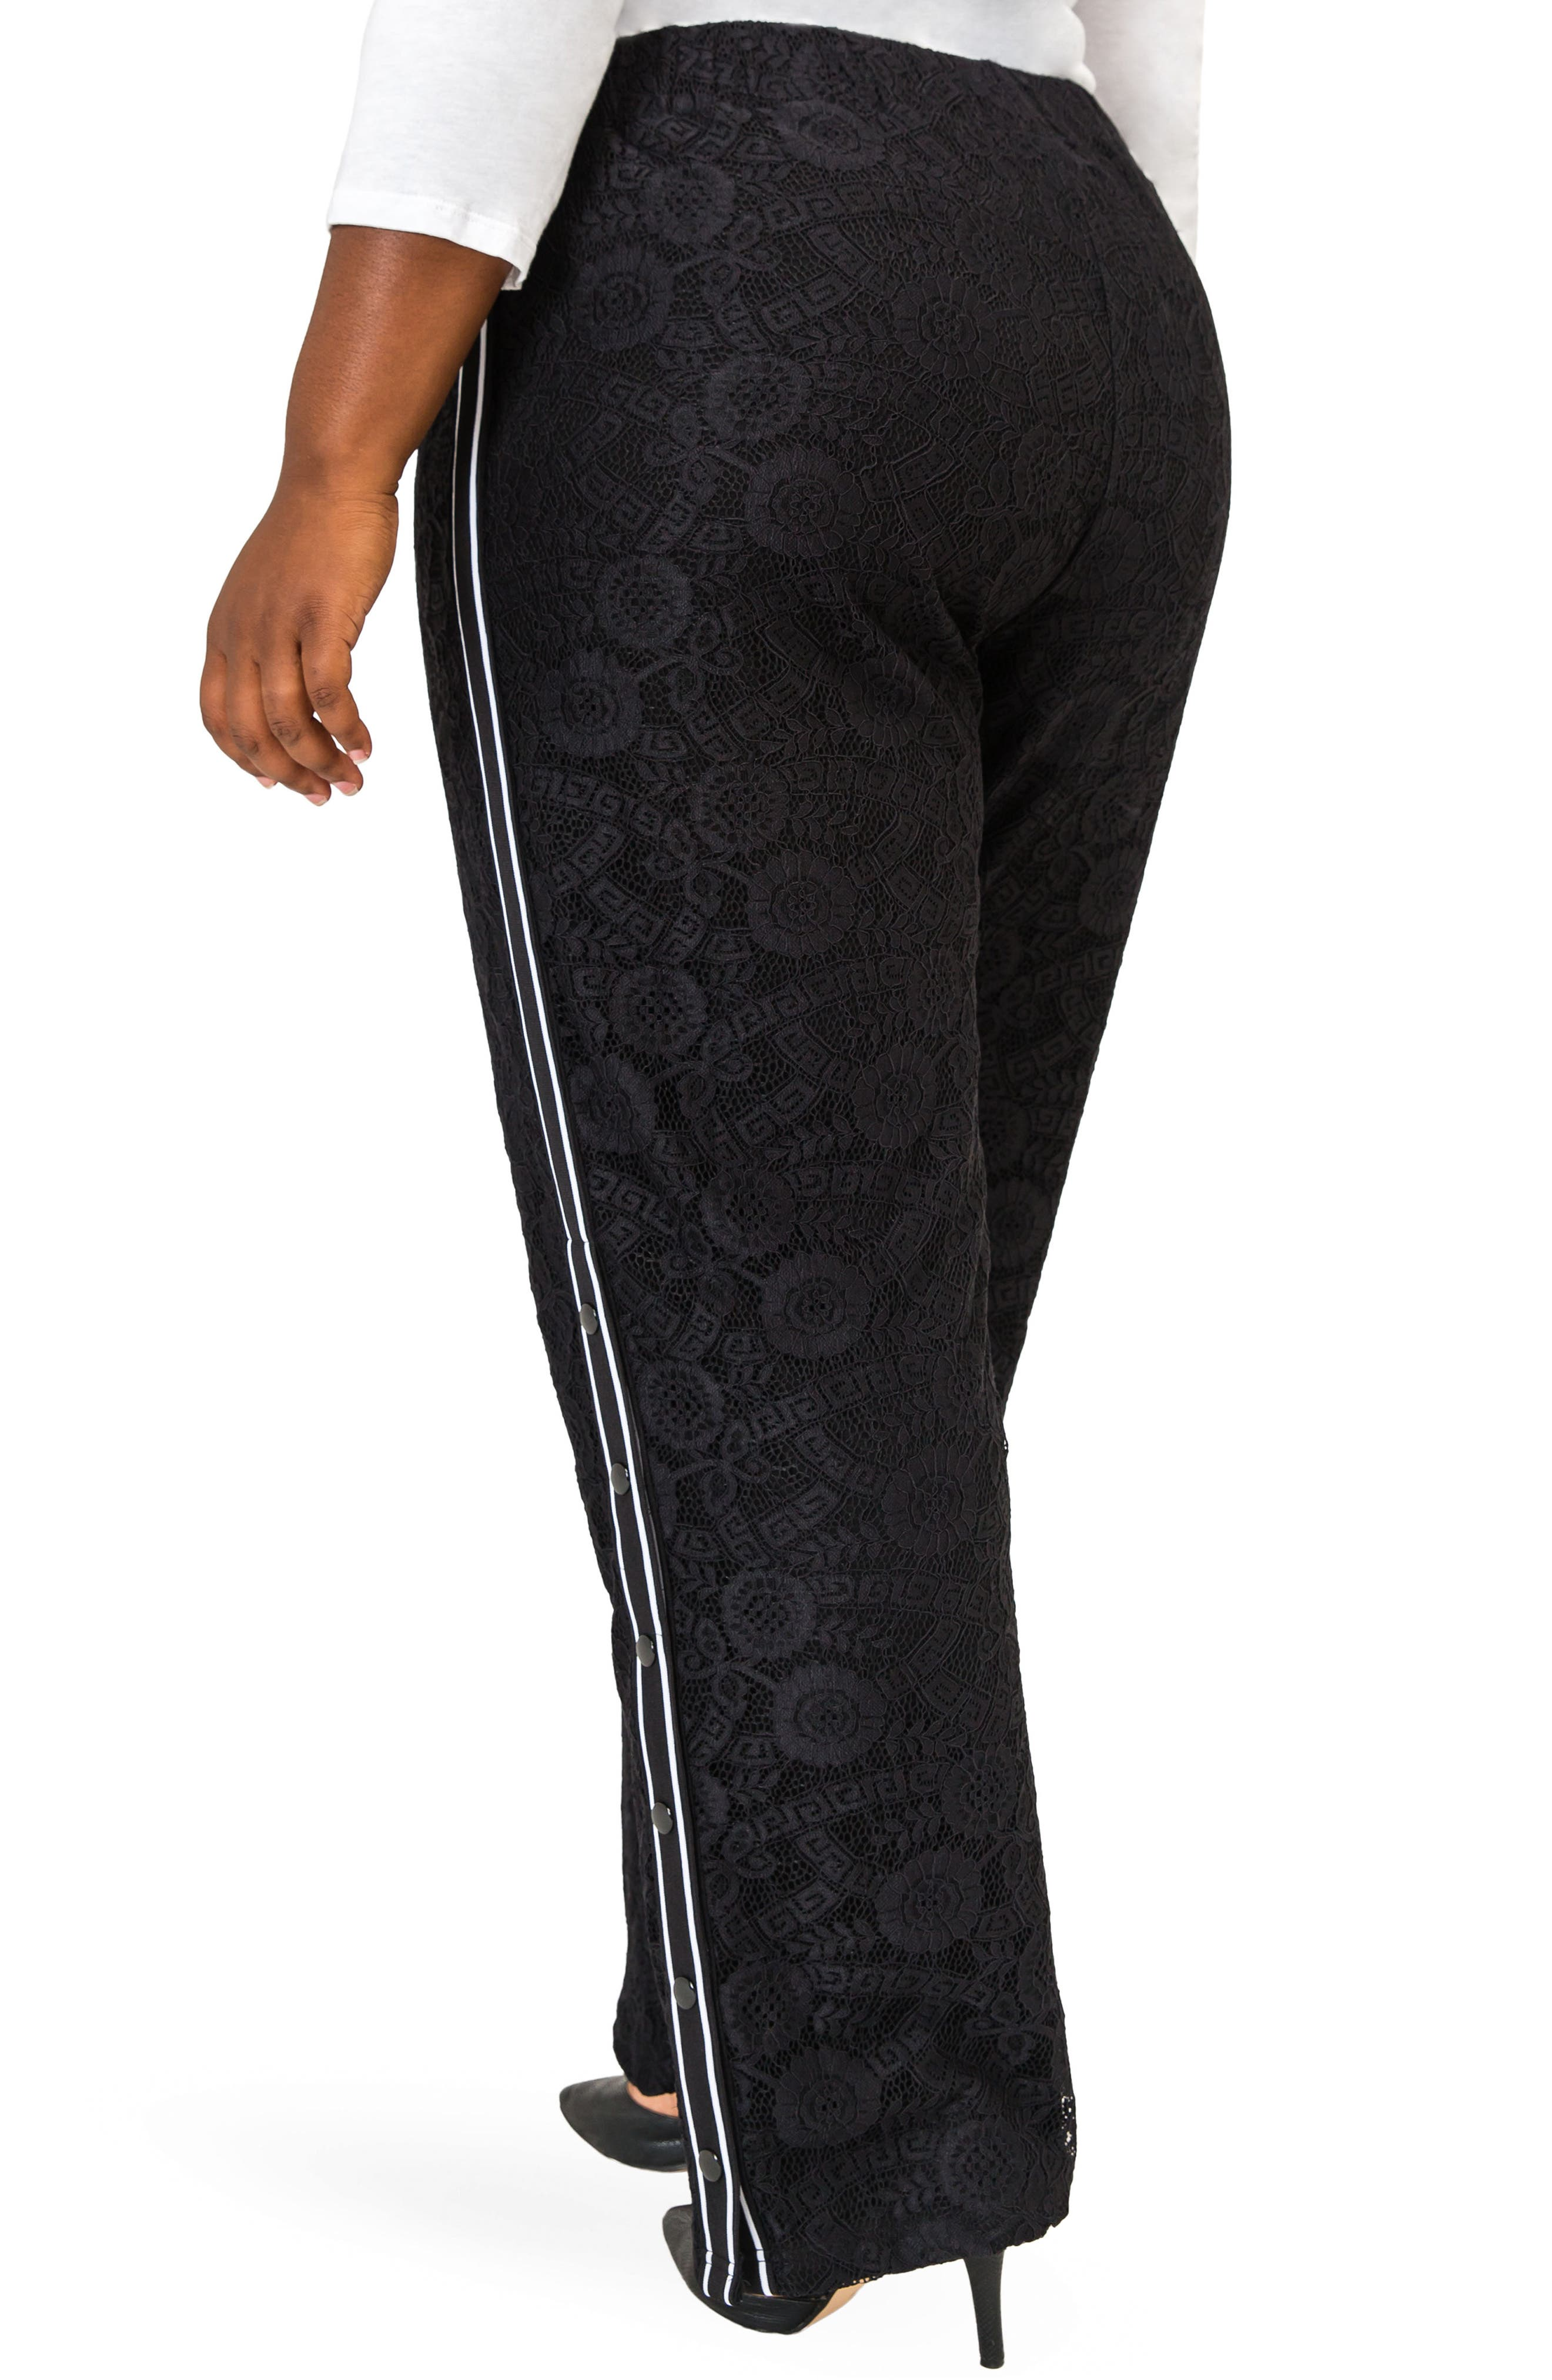 POETIC JUSTICE, Cornella High Rise Lace Knit Track Pants, Alternate thumbnail 2, color, BLACK